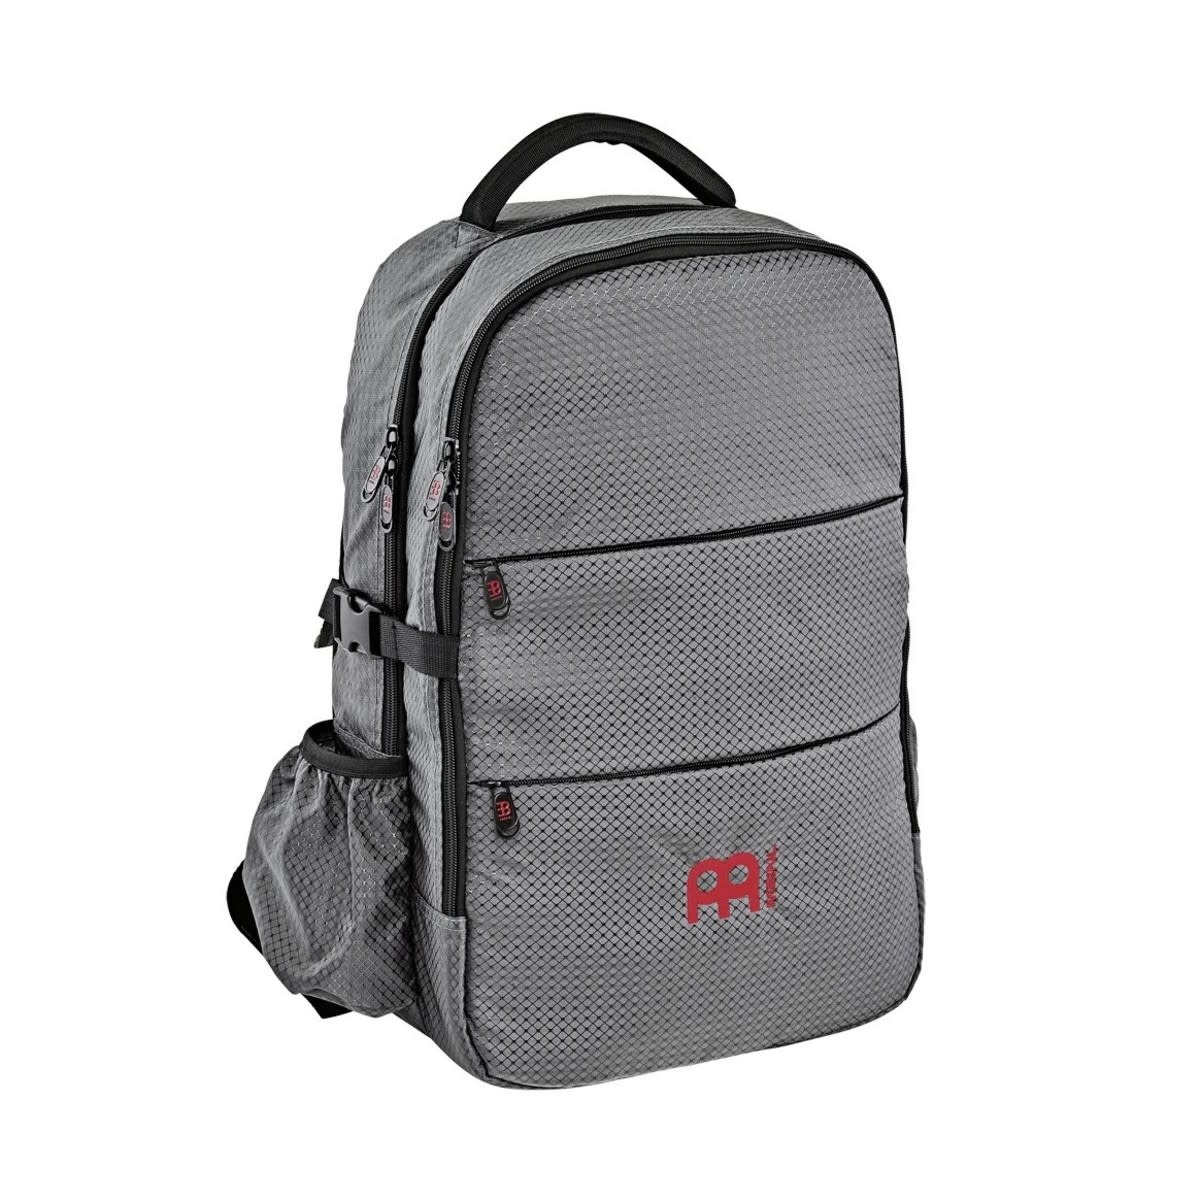 Meinl Meinl Percussion Backpack